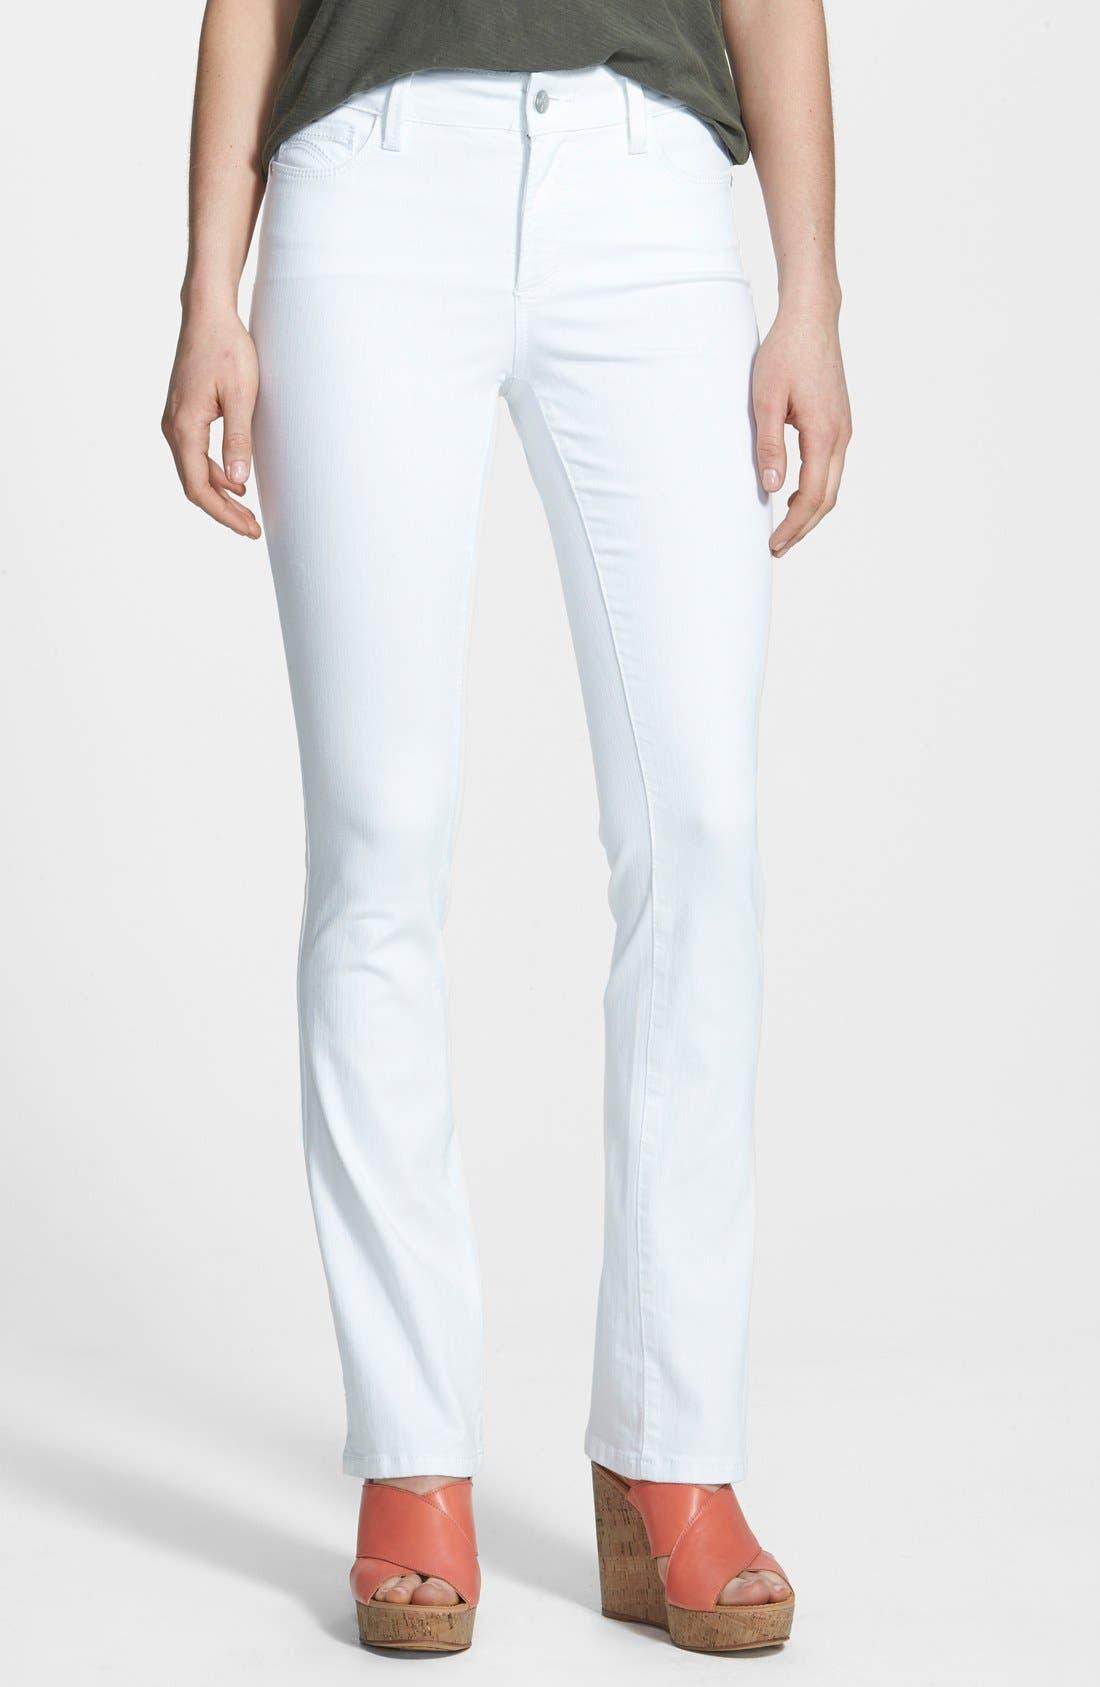 'Billie' Stretch Mini Bootcut Jeans,                         Main,                         color, 103